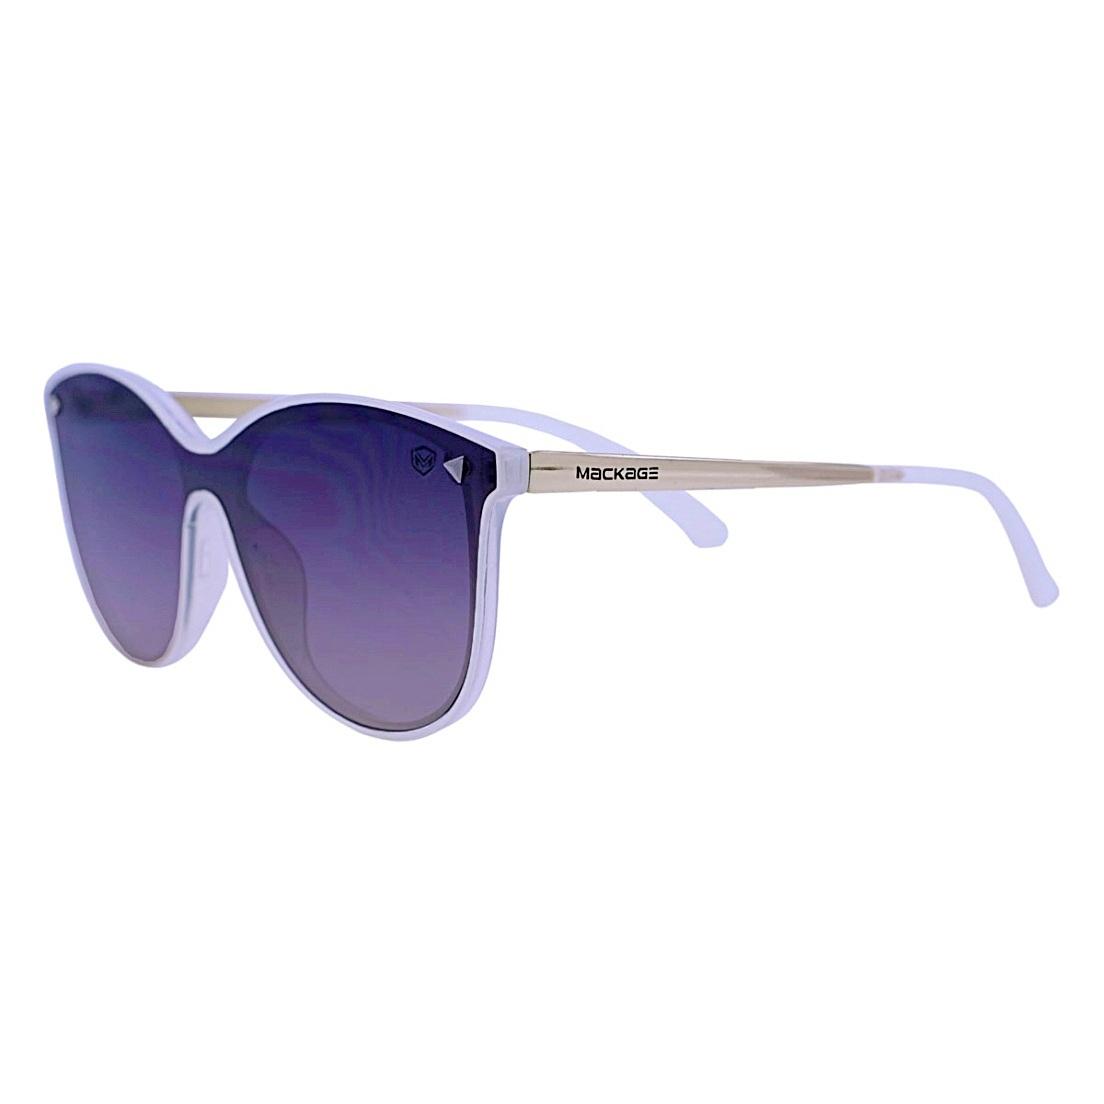 Óculos de Sol Mackage Feminino Acetato/Metal Rimless Gateado - Dourado/Branco